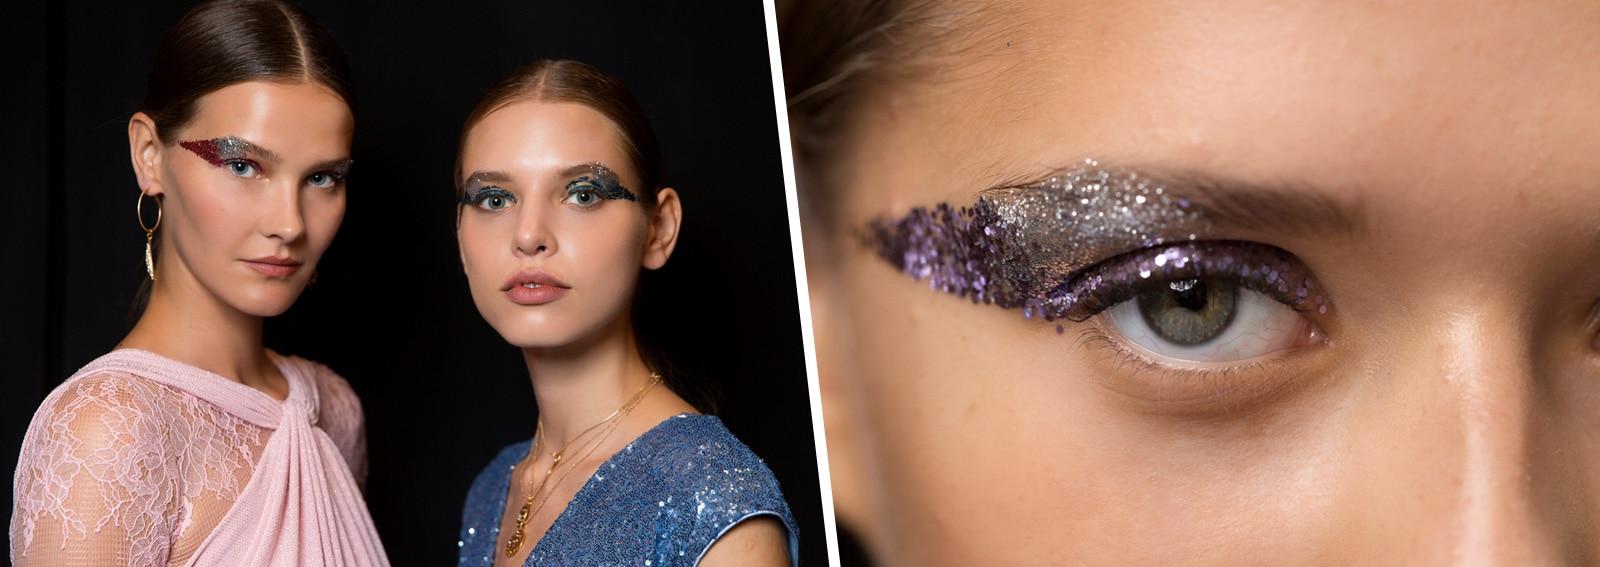 DESKTOP_Glitter-eye-tutti-i-make-up-occhi-pió-belli-per-la-primavera